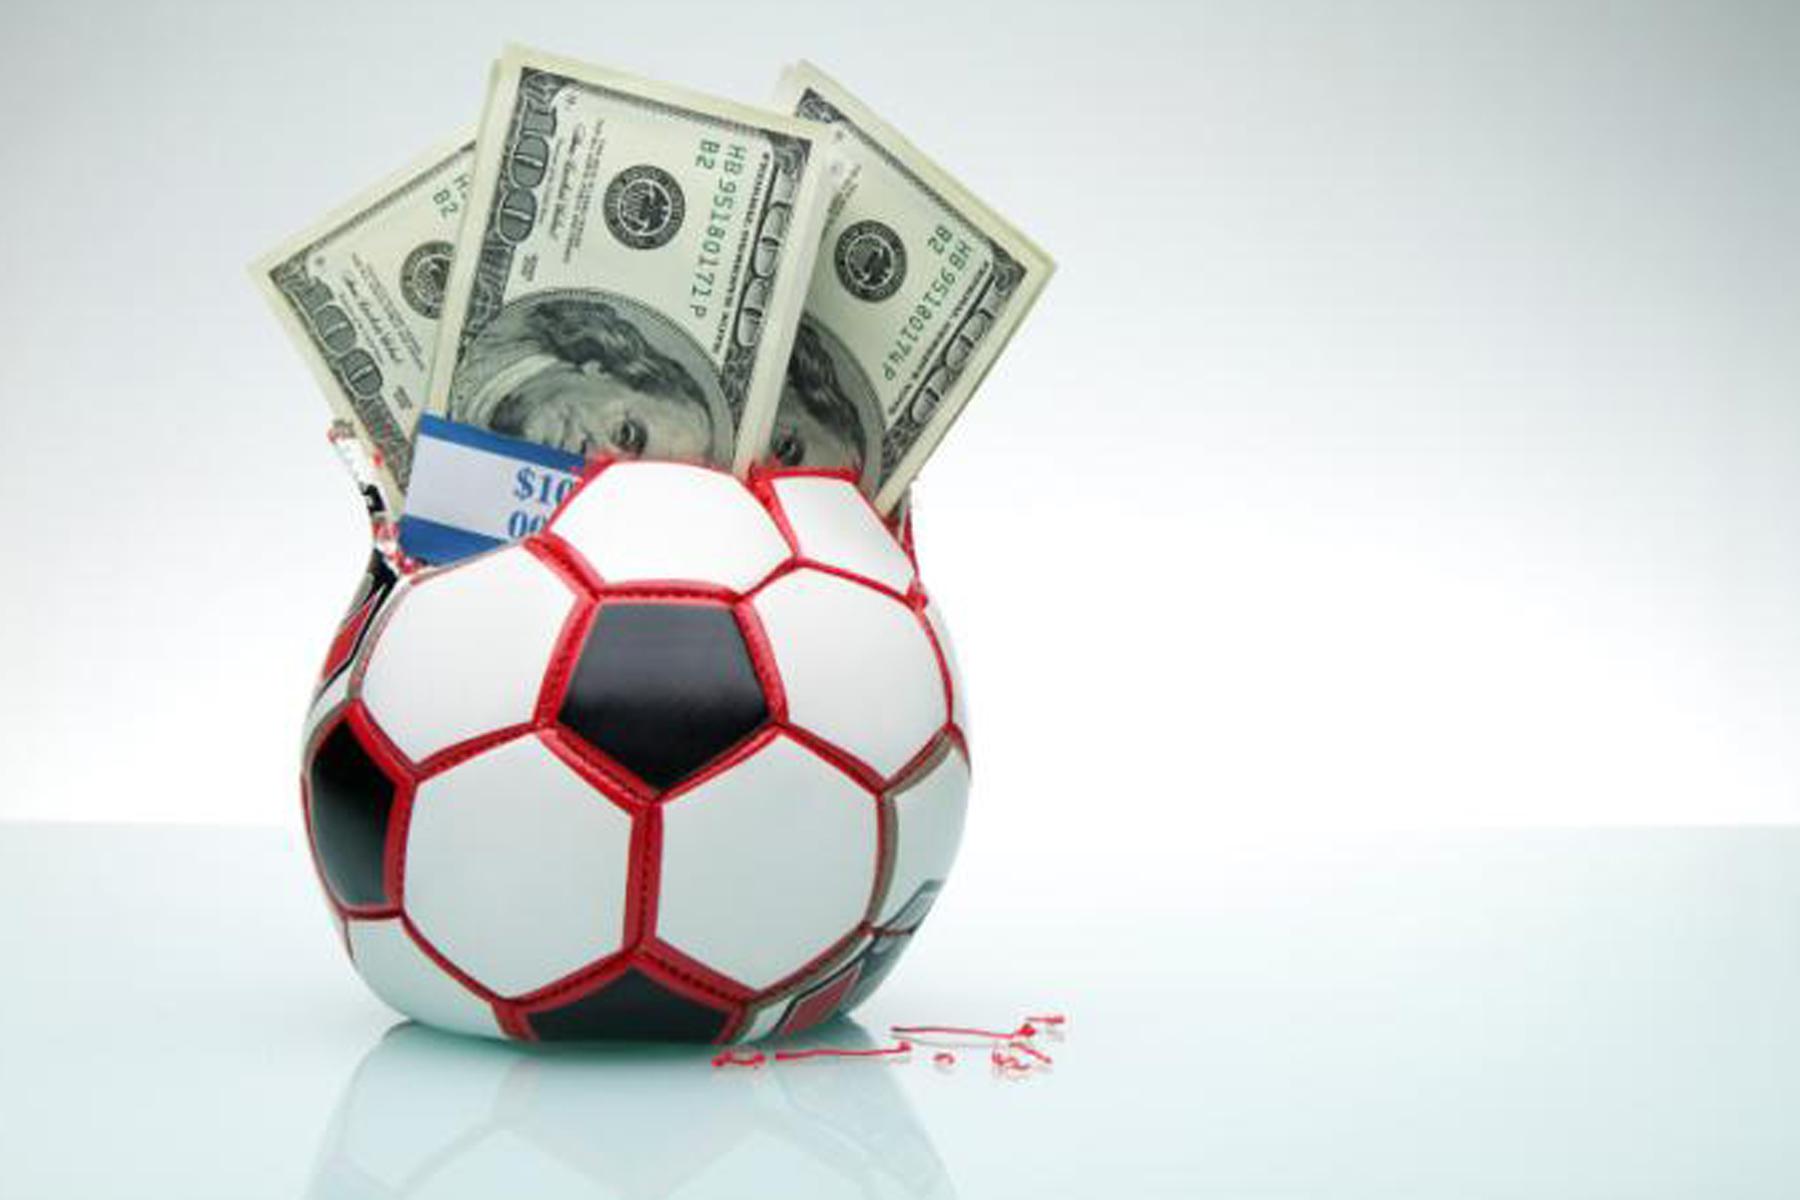 Calcio e Camorra: partite truccate in serie B